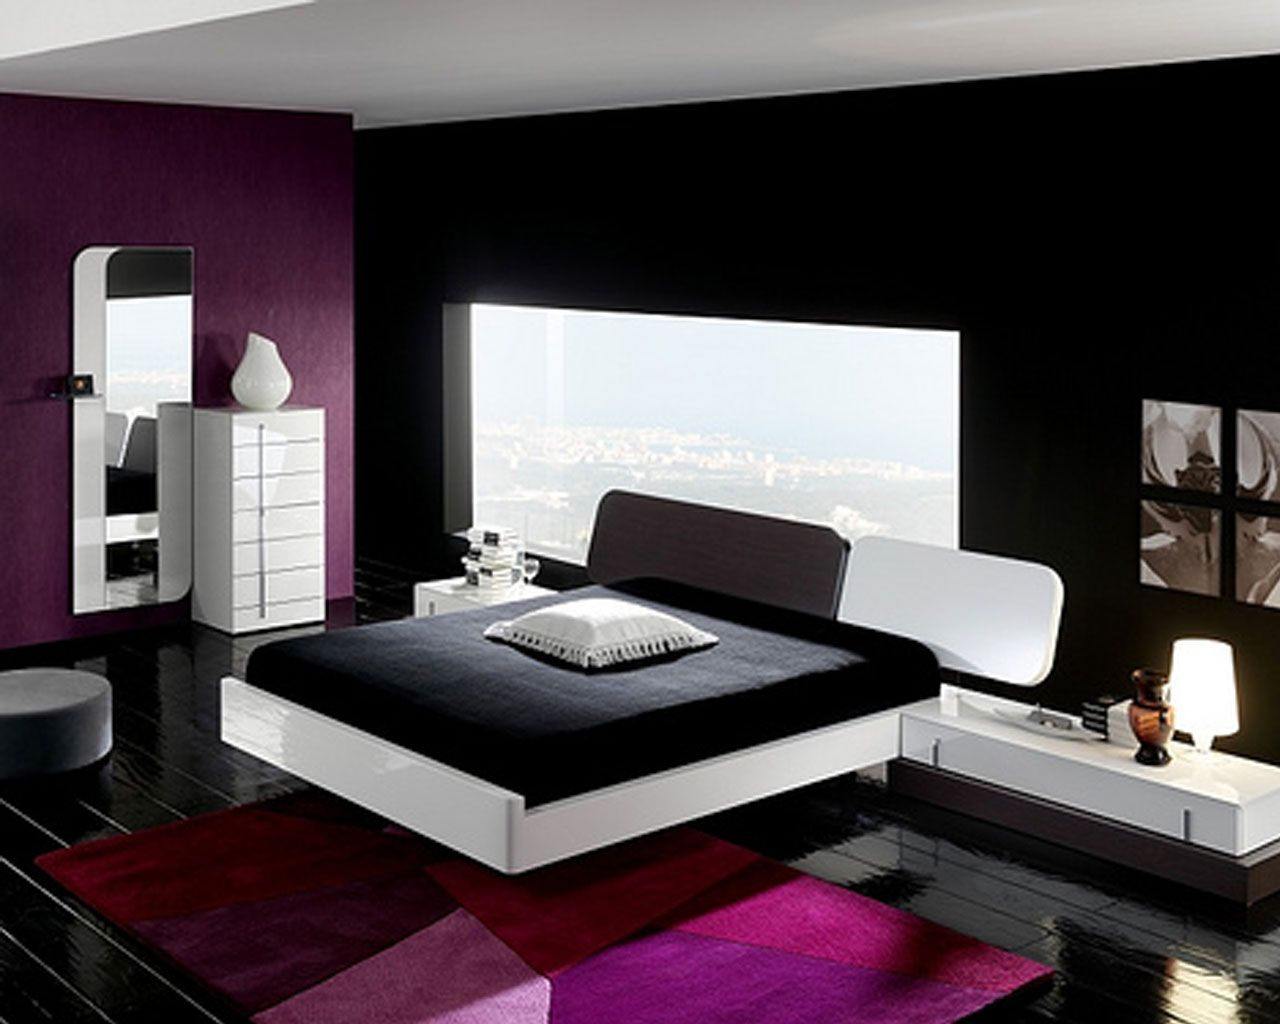 Elegant Impression At Black White Bedroom Design Aida Homes - Black white and pink bedroom designs